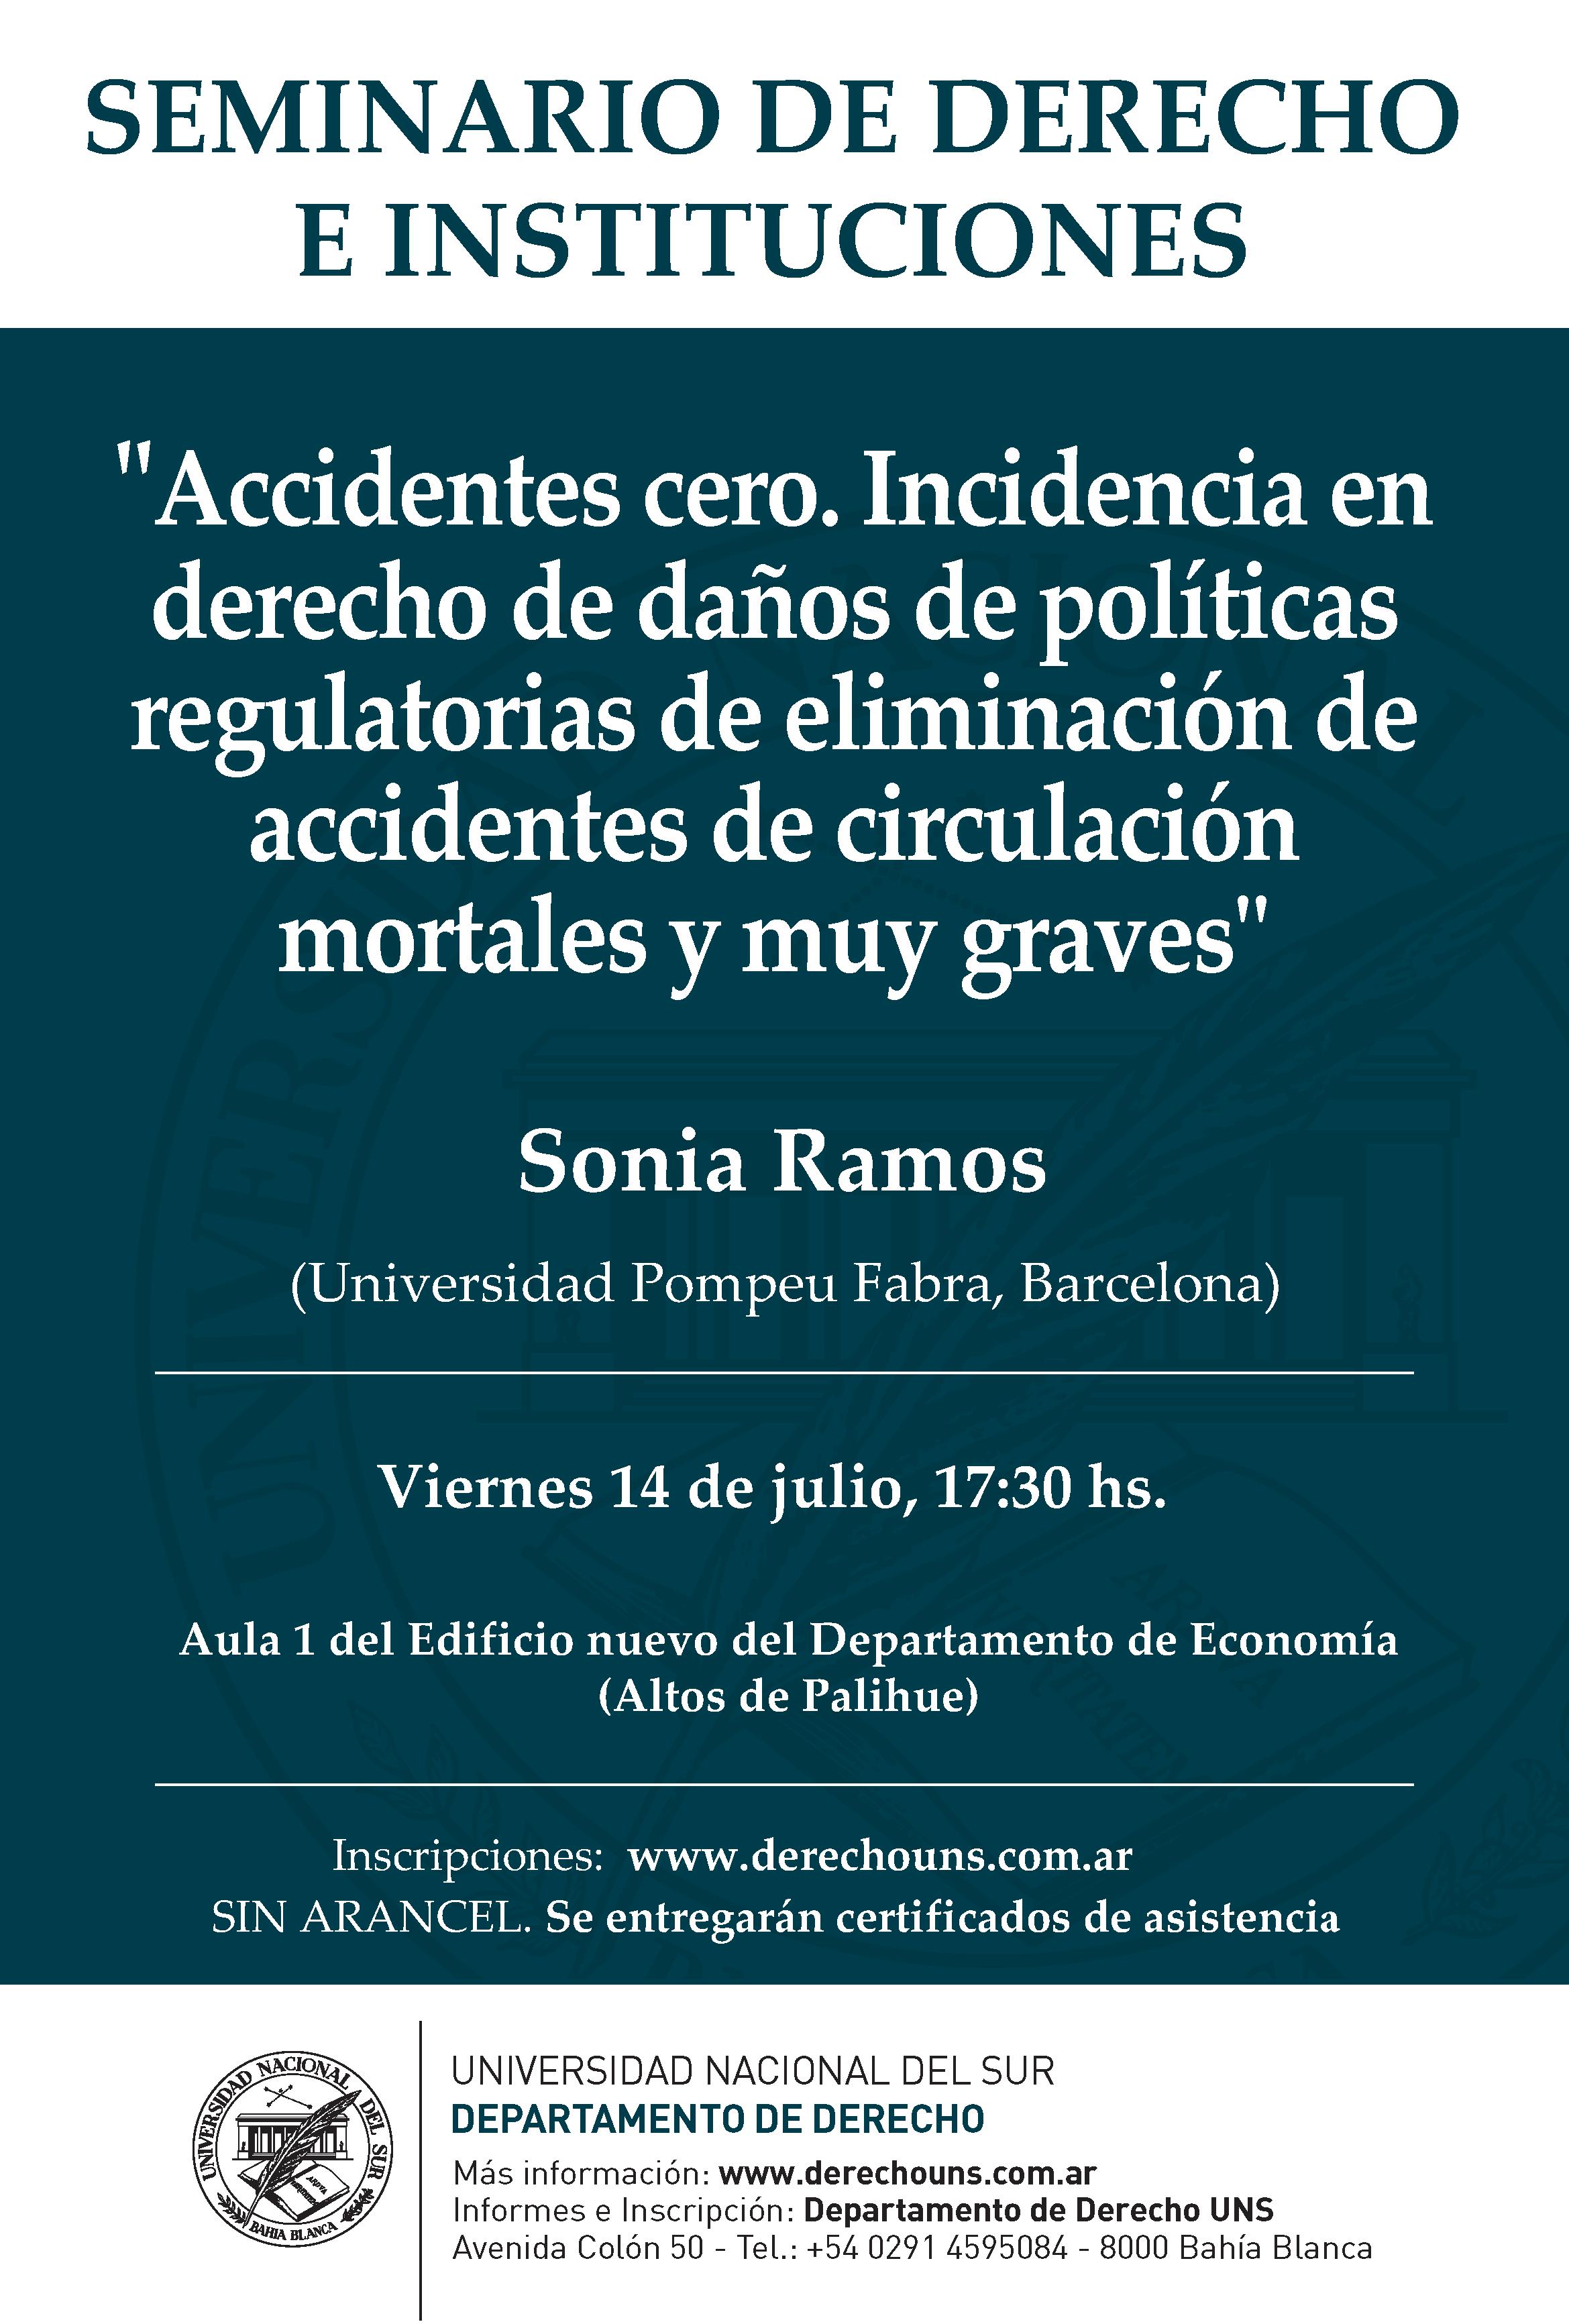 Seminario-Derecho-Instituciones-01-2017